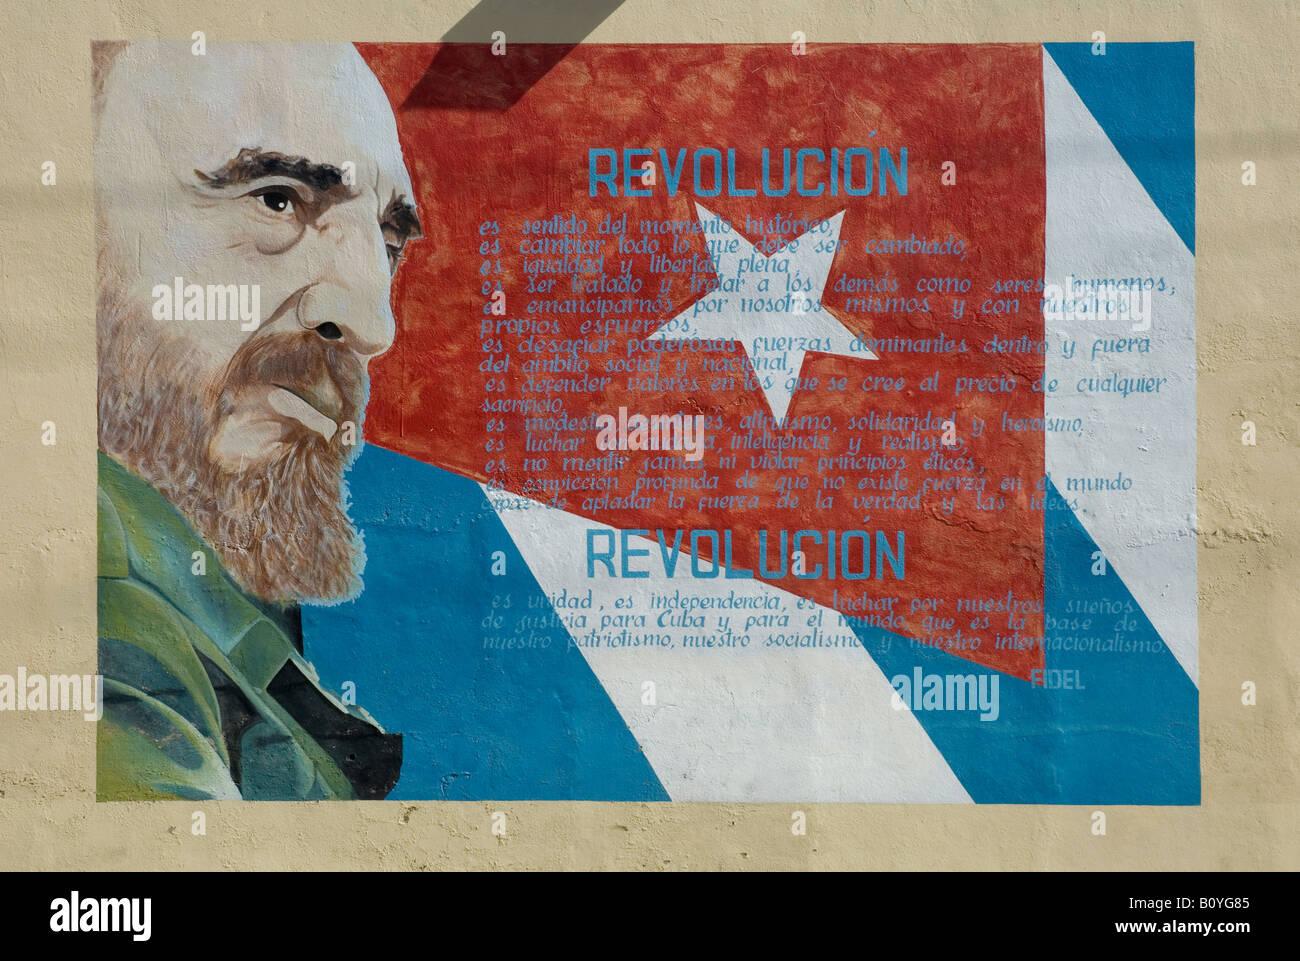 Mural featuring image of Fidel Castro in Cienfuegos, Cuba. Stock Photo